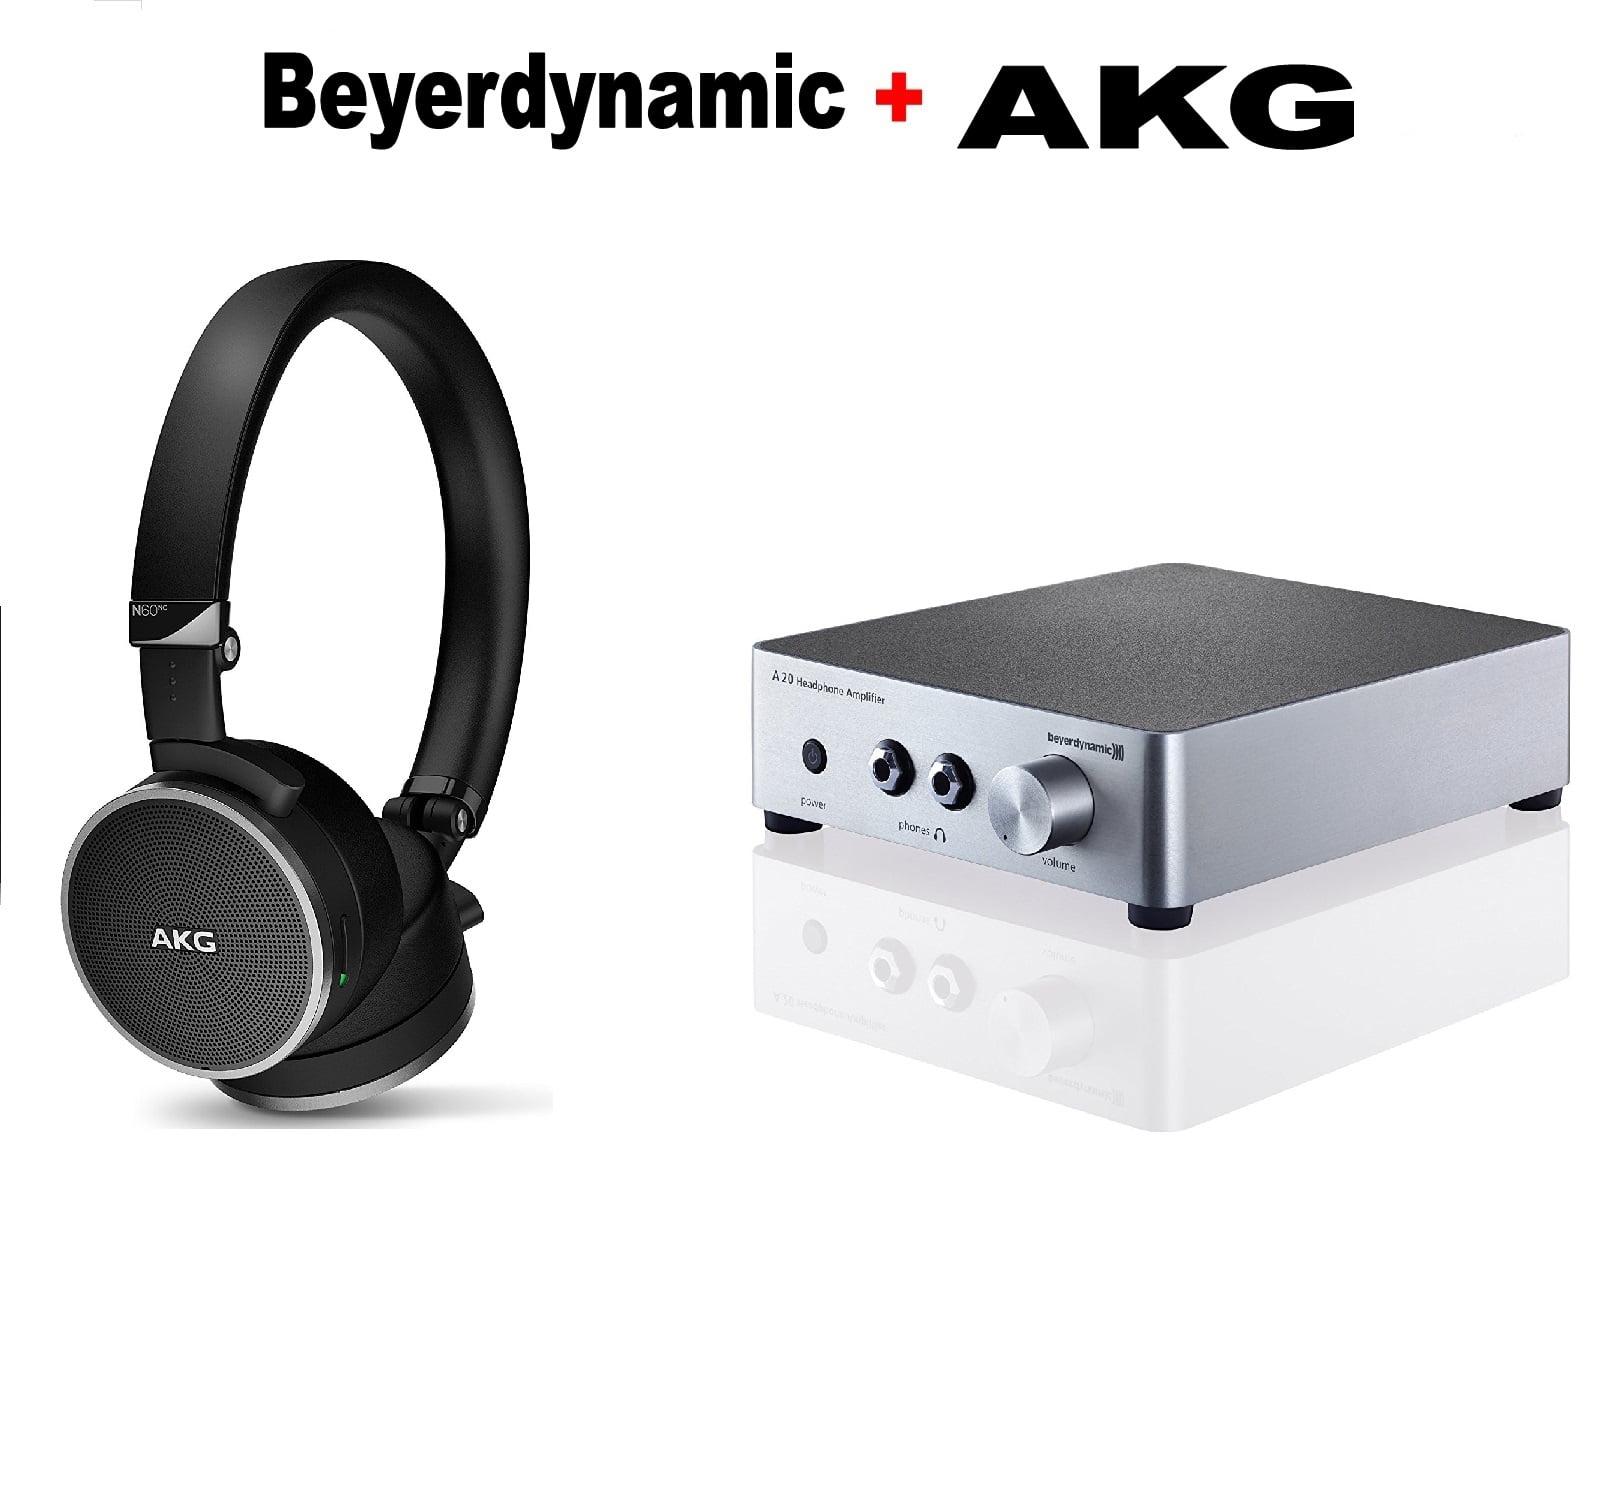 AKG N60 NC Noise-Canceling On-Ear Headphones (Black) + Beyerdynamic A20 Headphone Amplifier - Silver Bundle